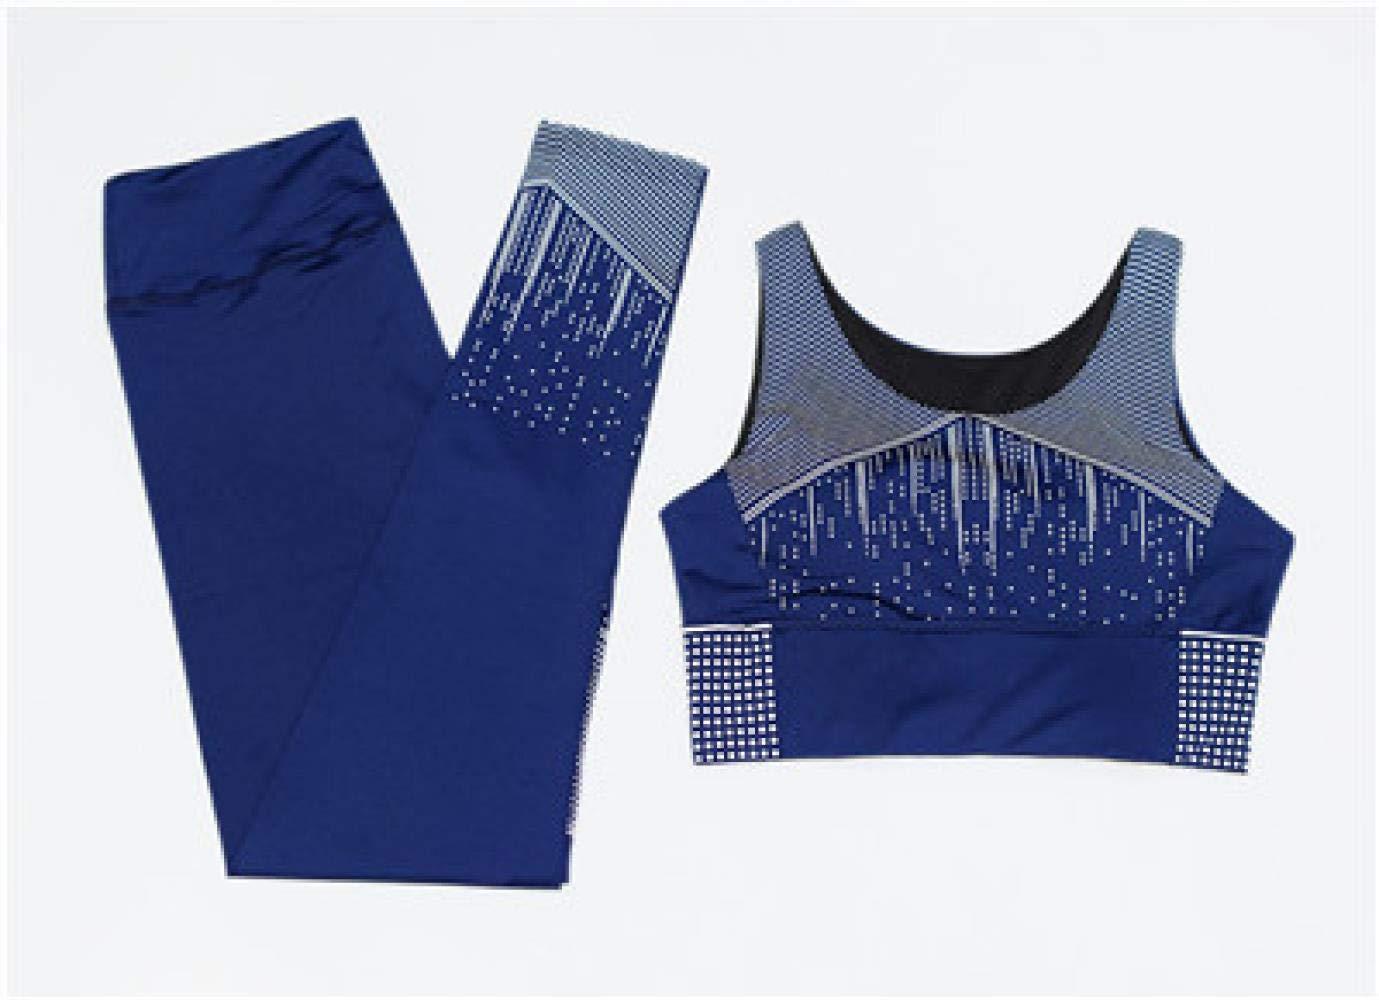 YANGCONG Yoga Fitness Bekleidung Frauen Yoga Set Weste + Strumpfhose Sportbekleidung Gym Sport BH Hosen Fitness Sport Anzug Laufbekleidung 2 STÜCKE dunkelblau M